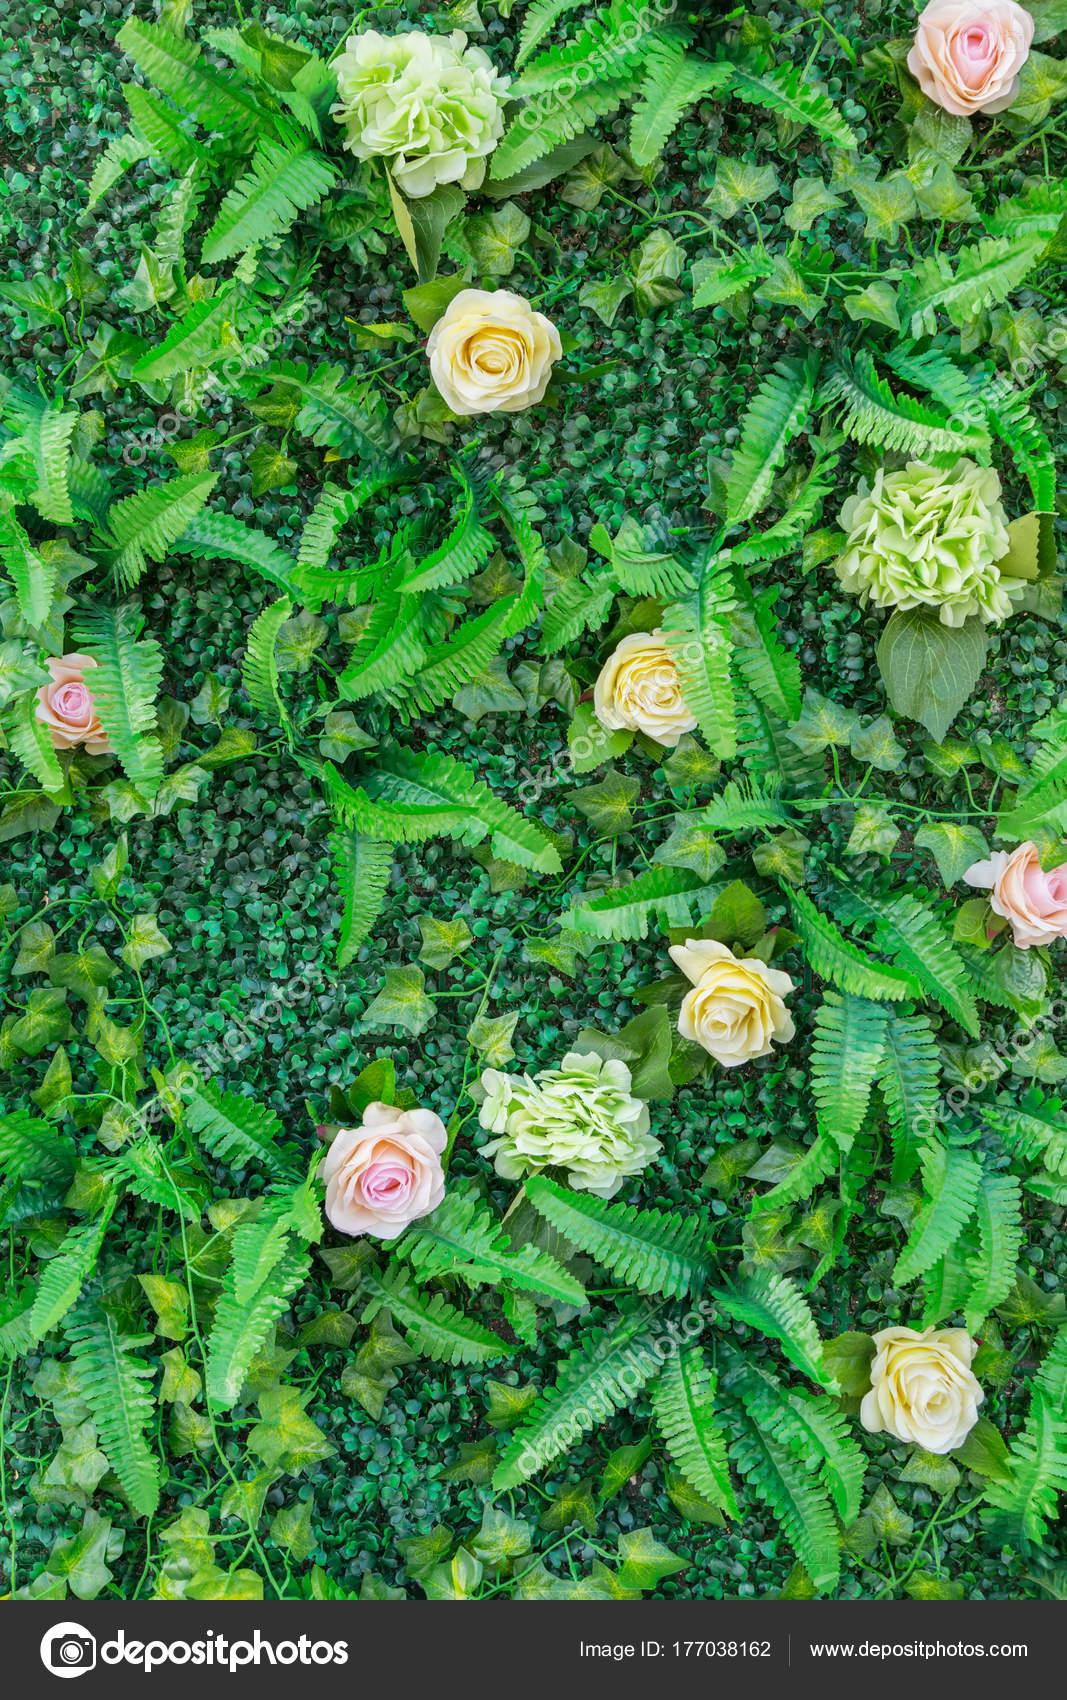 Blumen Pflanzen Wand — Stockfoto © 4045qd #177038162